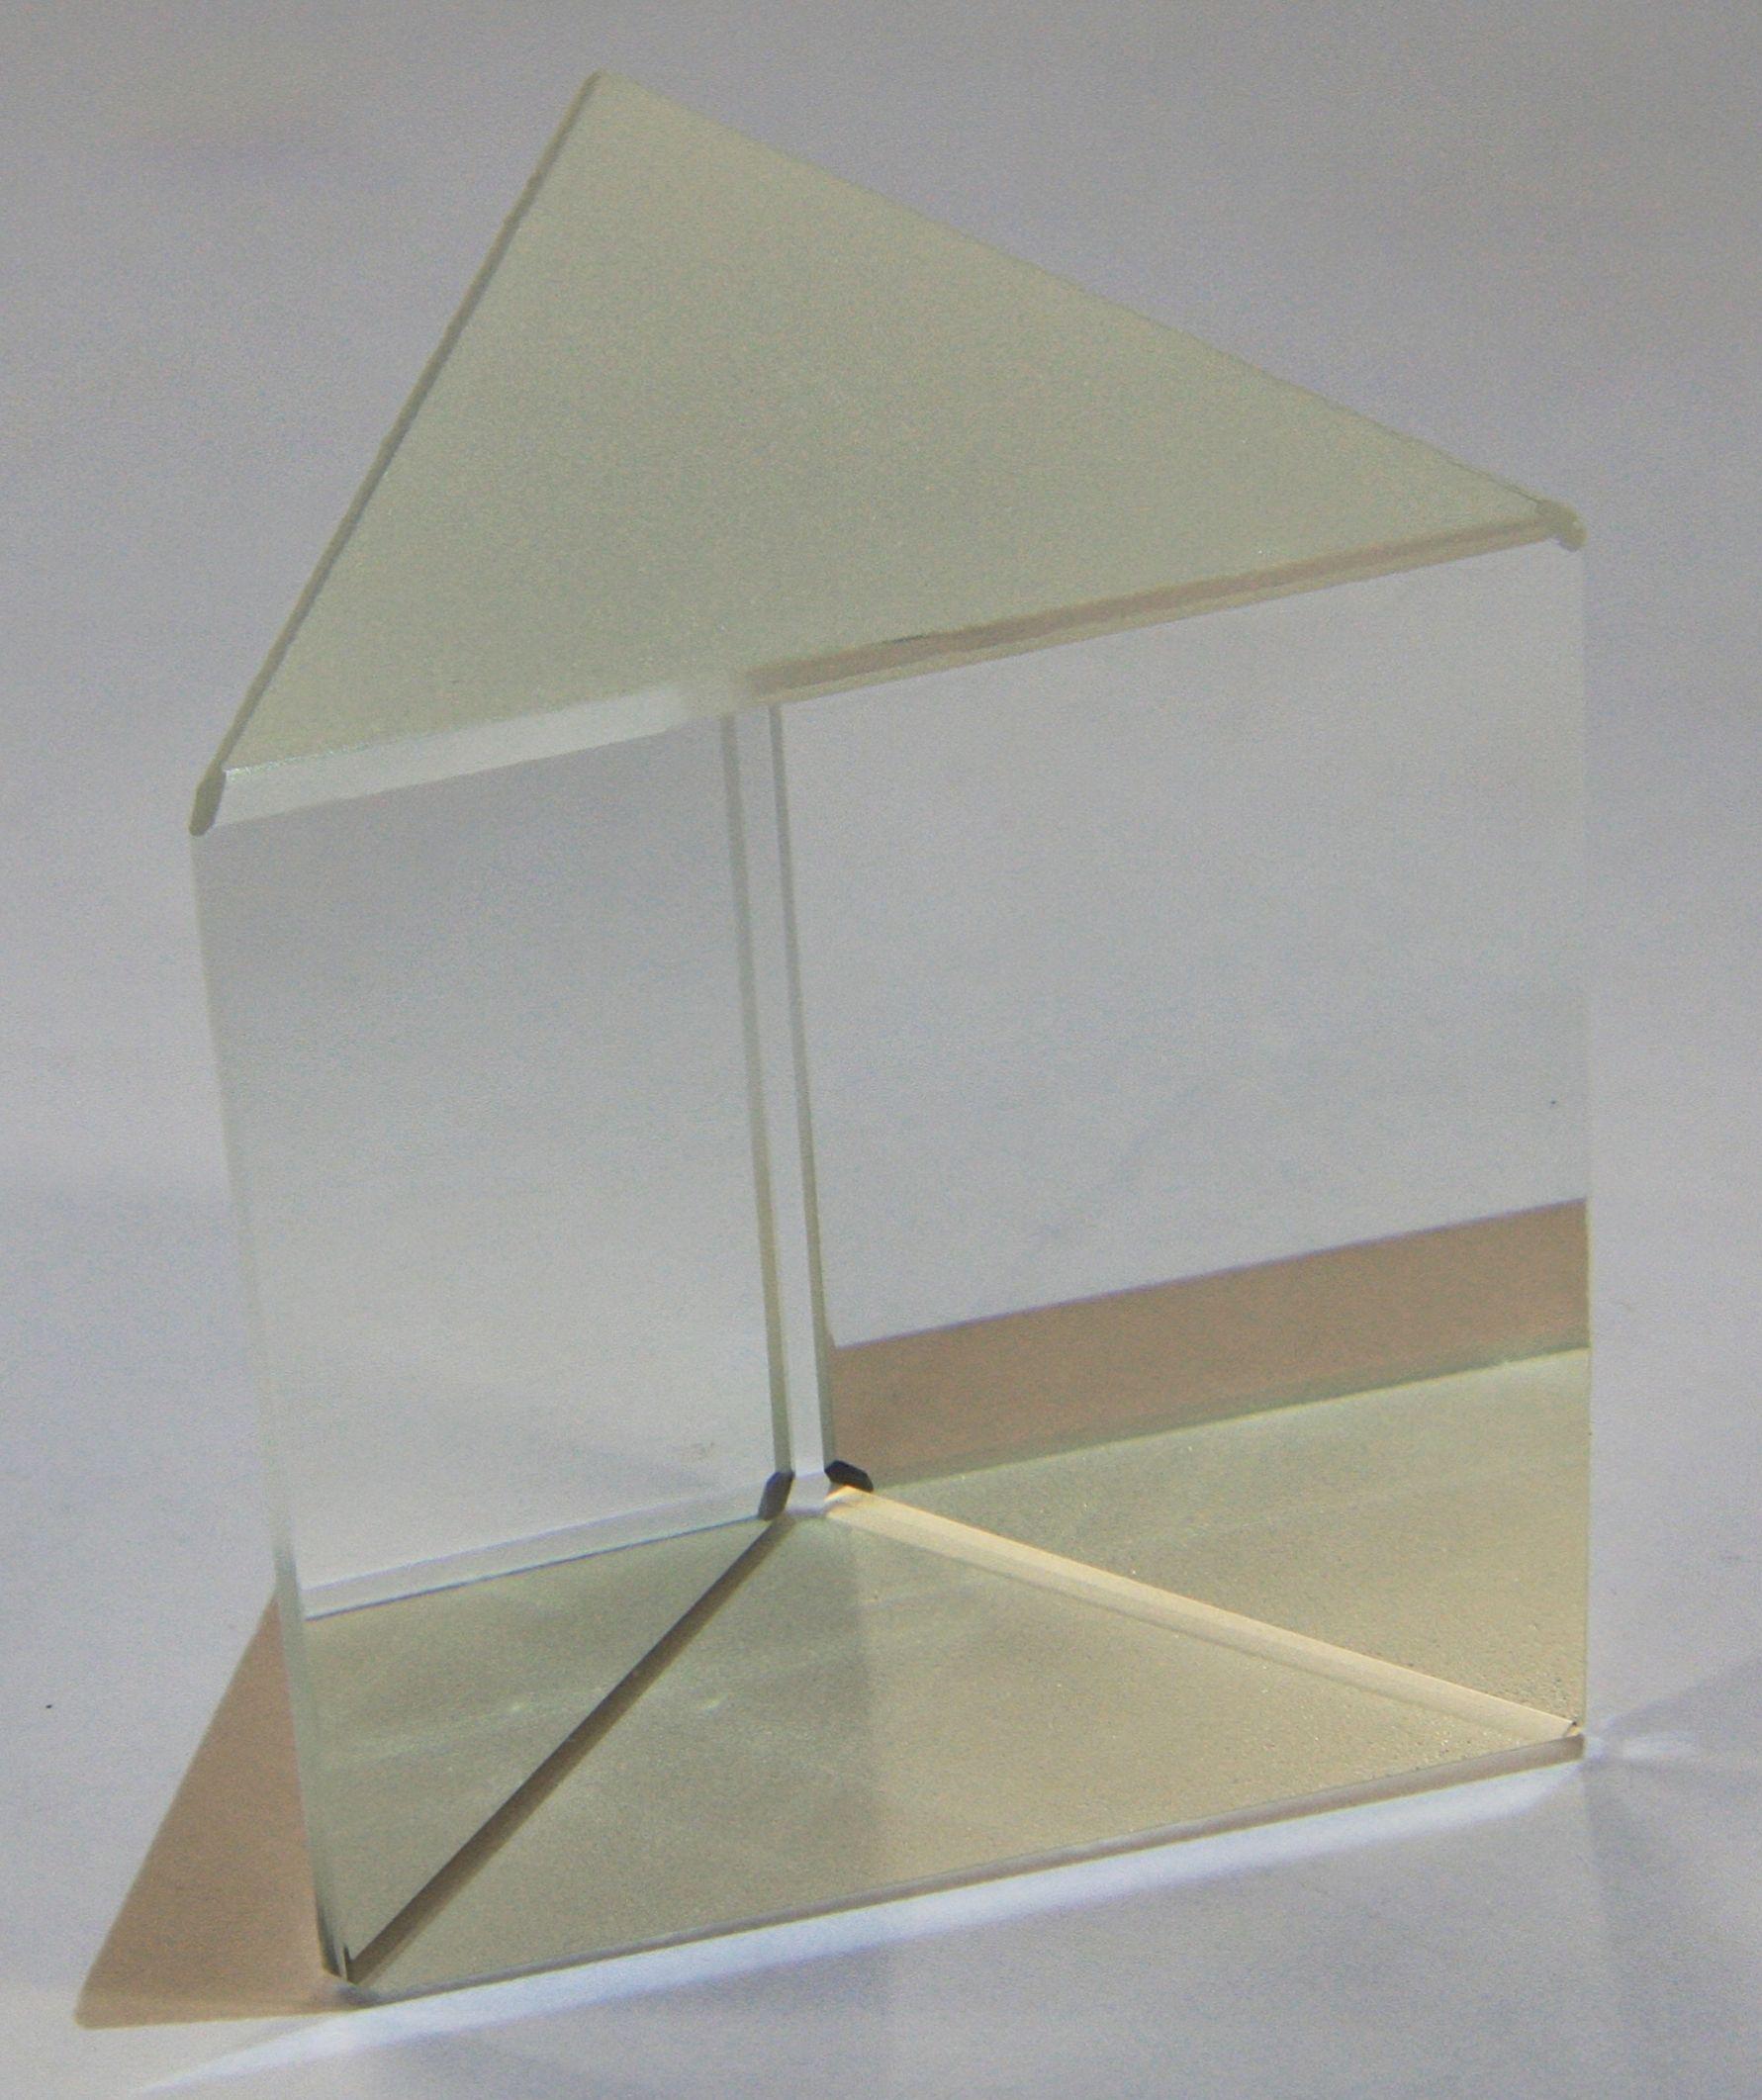 Rectangular Prism Real Life Examples: Wikipedia